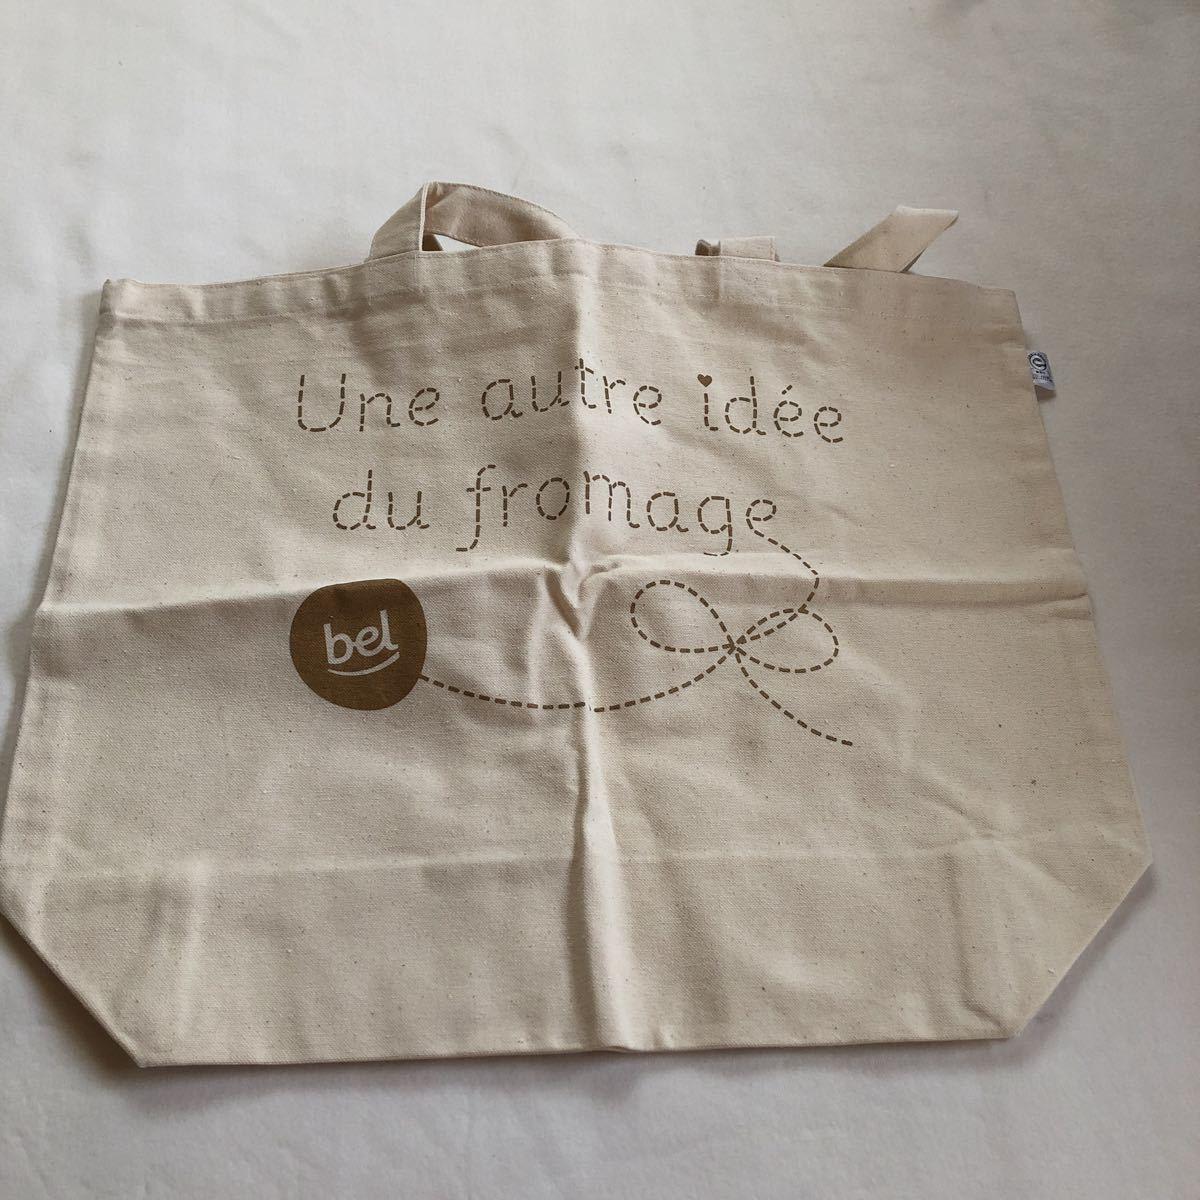 Une autre idee du fromage 鞄 かばん カバン コットンバック トートバッグ 非売品 新品 ノベルティグッズ エコバッグ_画像3